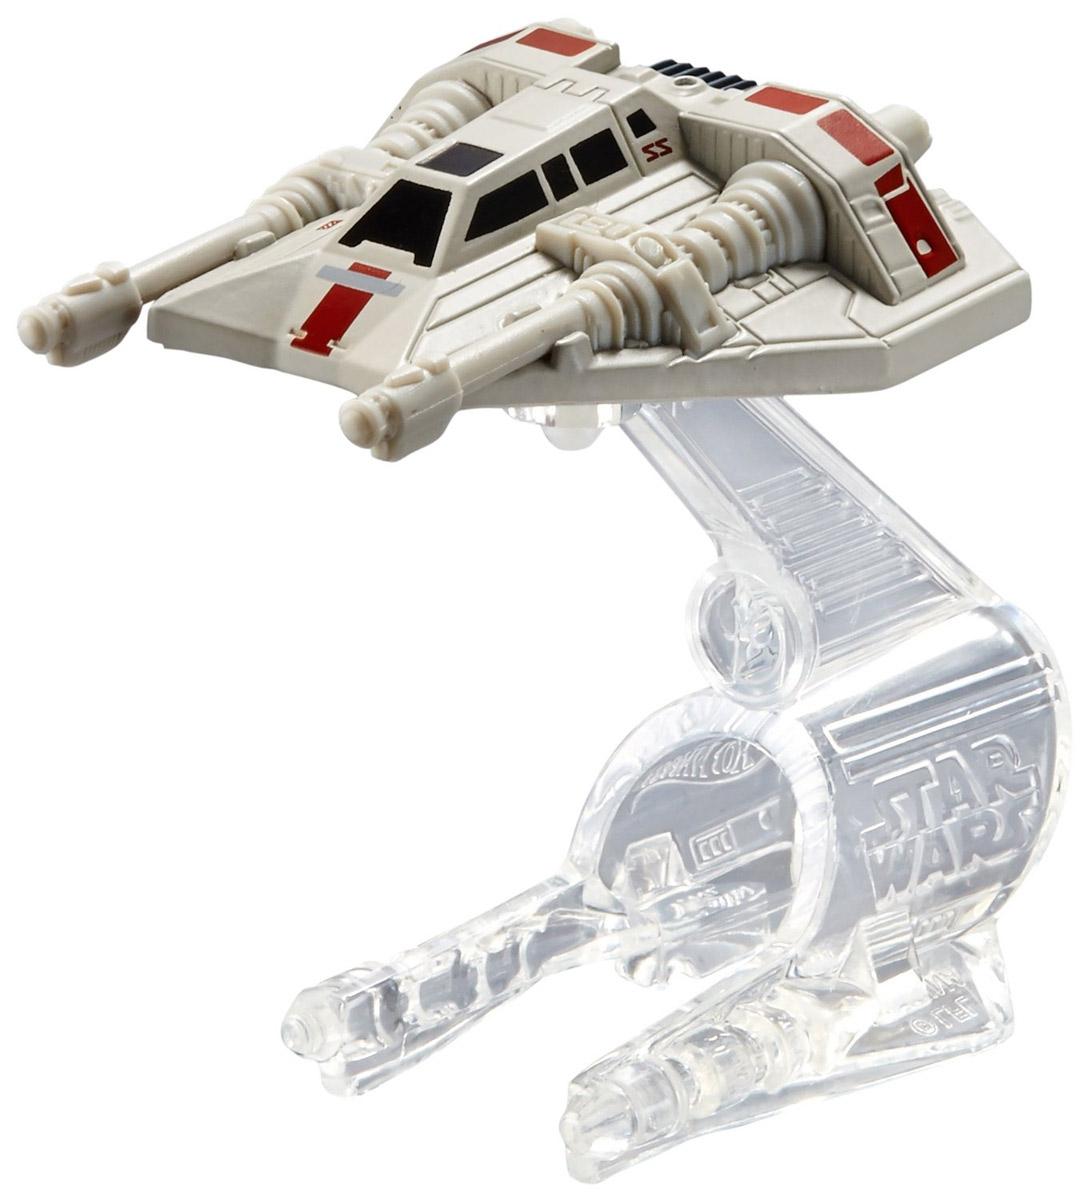 Hot Wheels Star Wars Звездные корабли AT-AT vs Rebel Snowspeeder